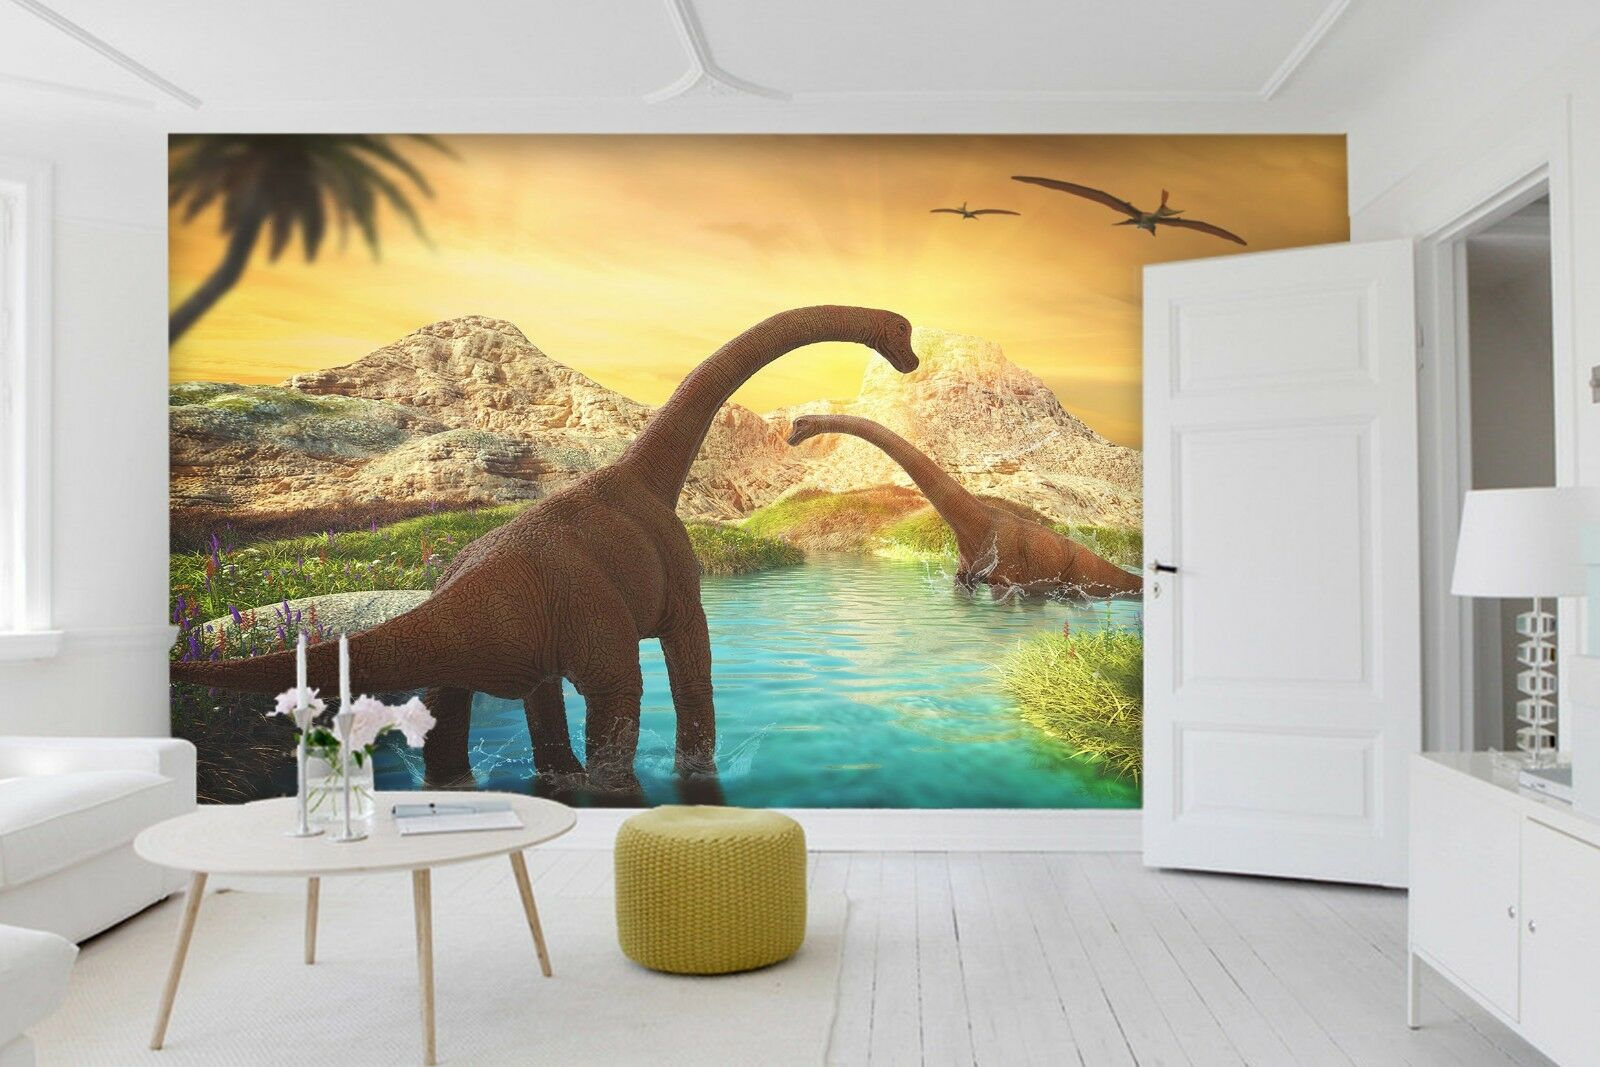 3D Sunset River Dinosaur 3 Wallpaper Mural Print Wall Indoor Wallpaper Murals UK